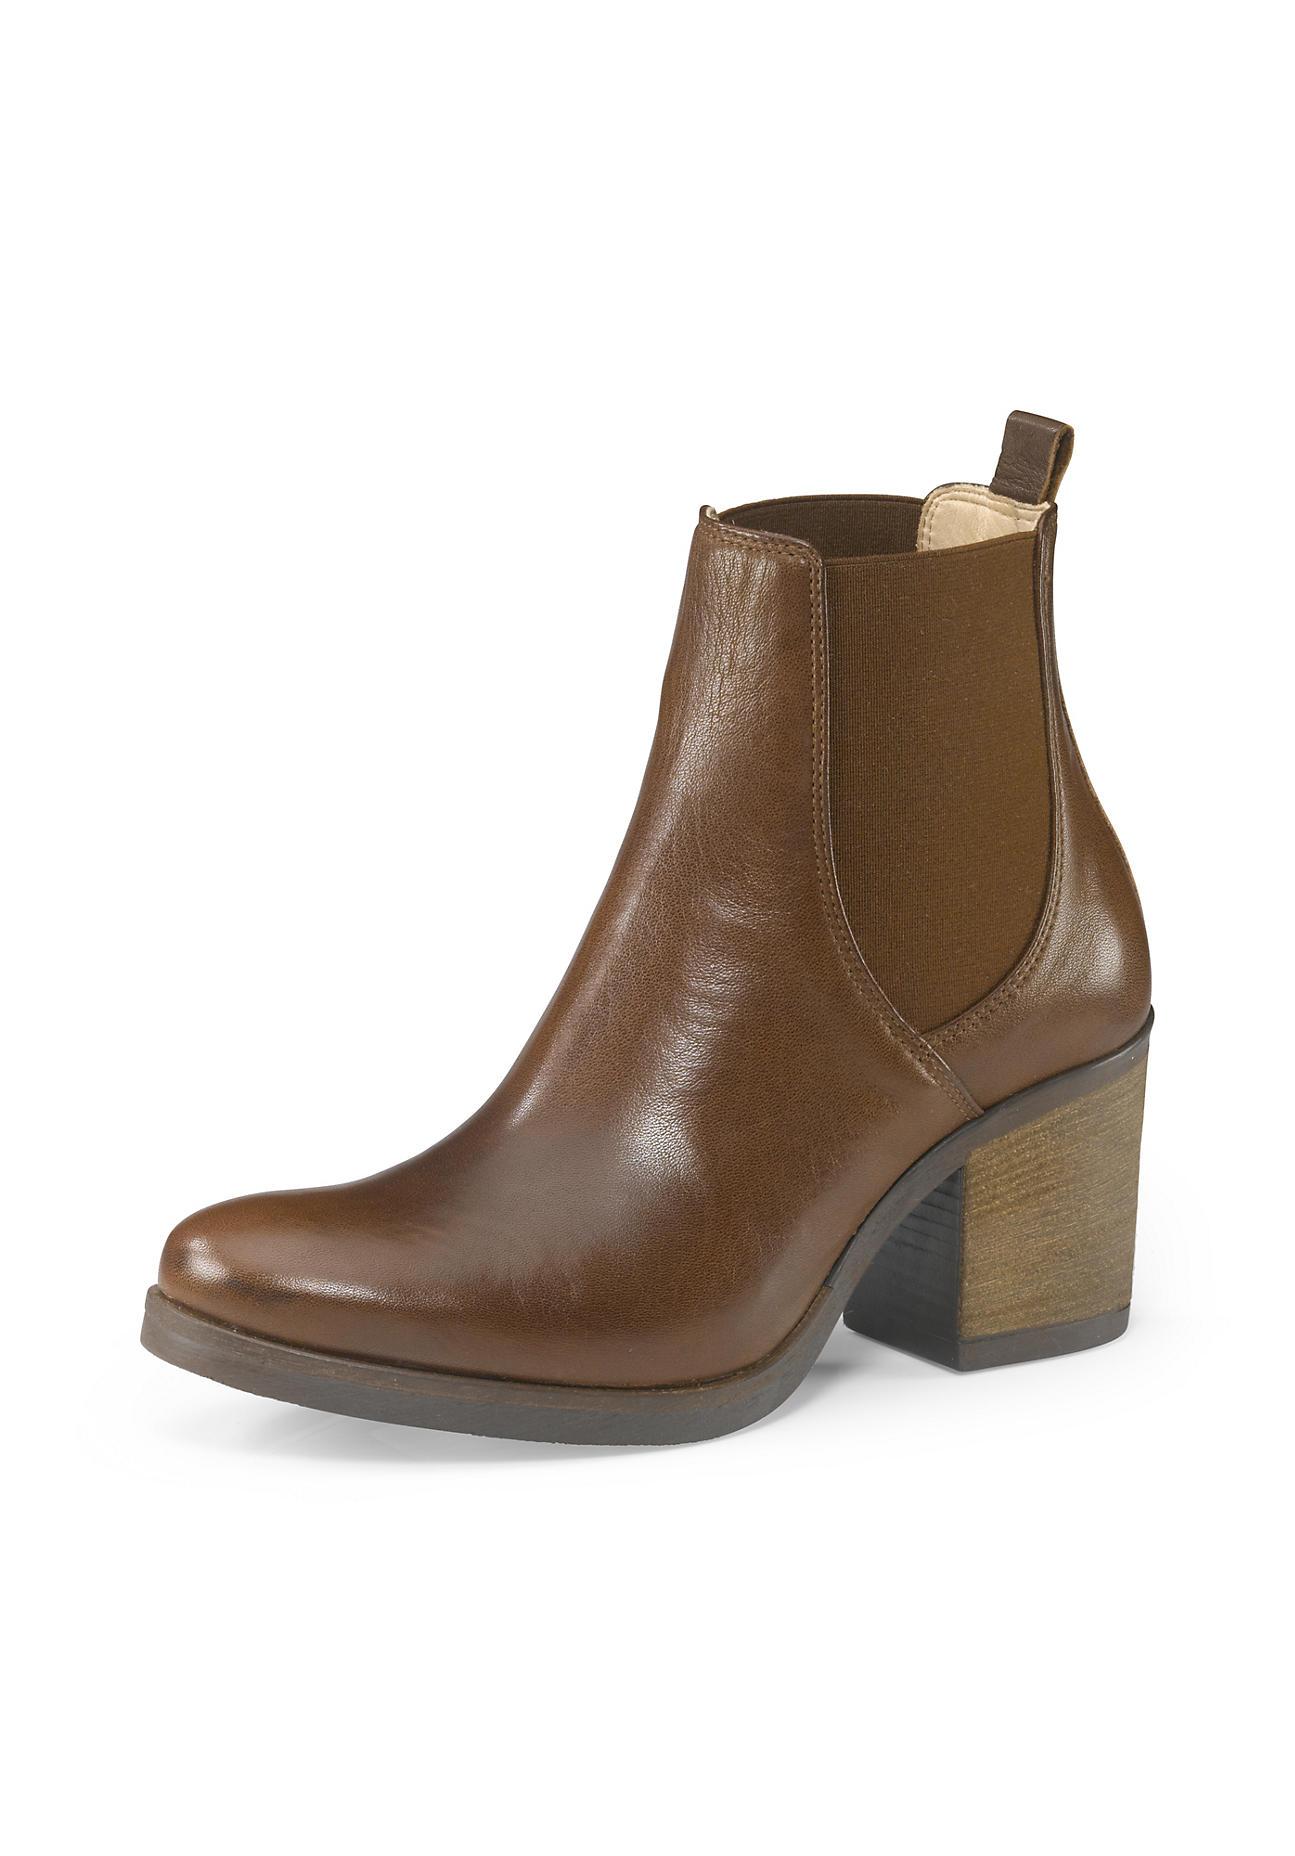 Stiefel - hessnatur Damen Damen Chelsea Boots aus Leder – braun –  - Onlineshop Hessnatur